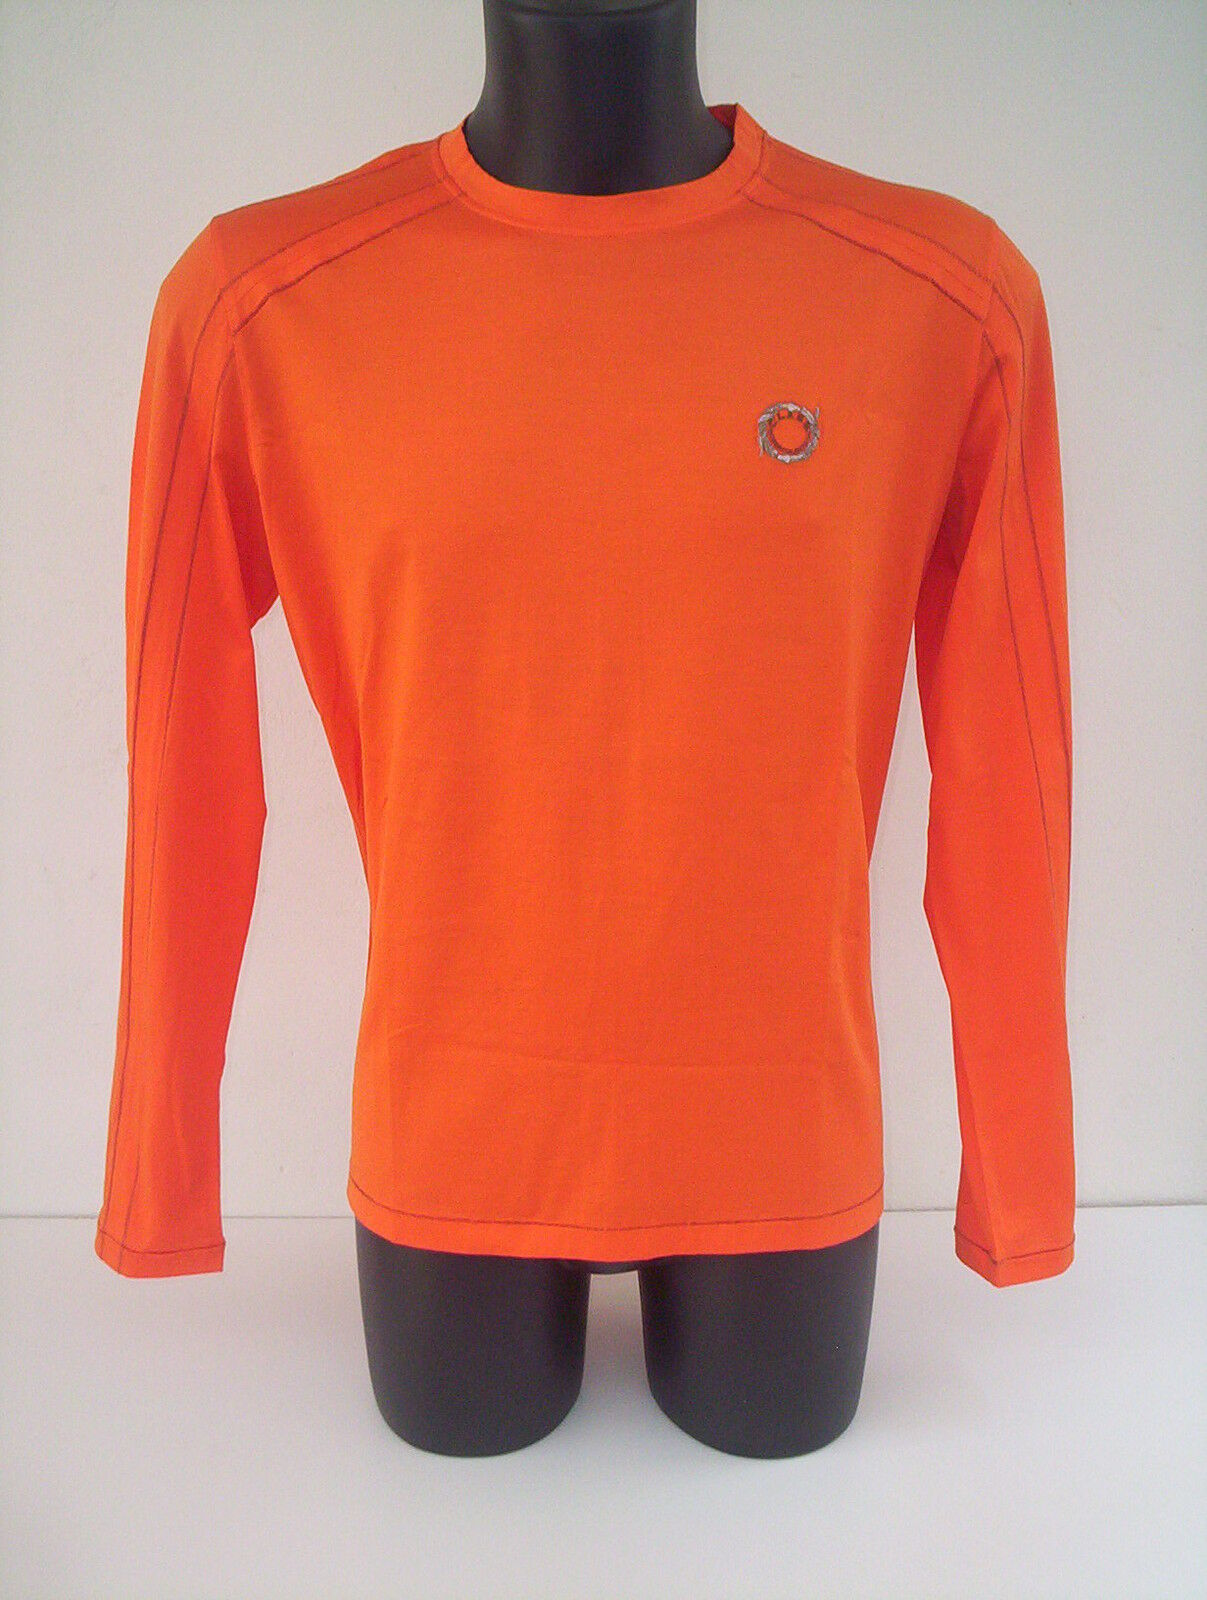 Roberto  Cavalli t- shirt    arancio  tg 46 con finitura coloreata 141205